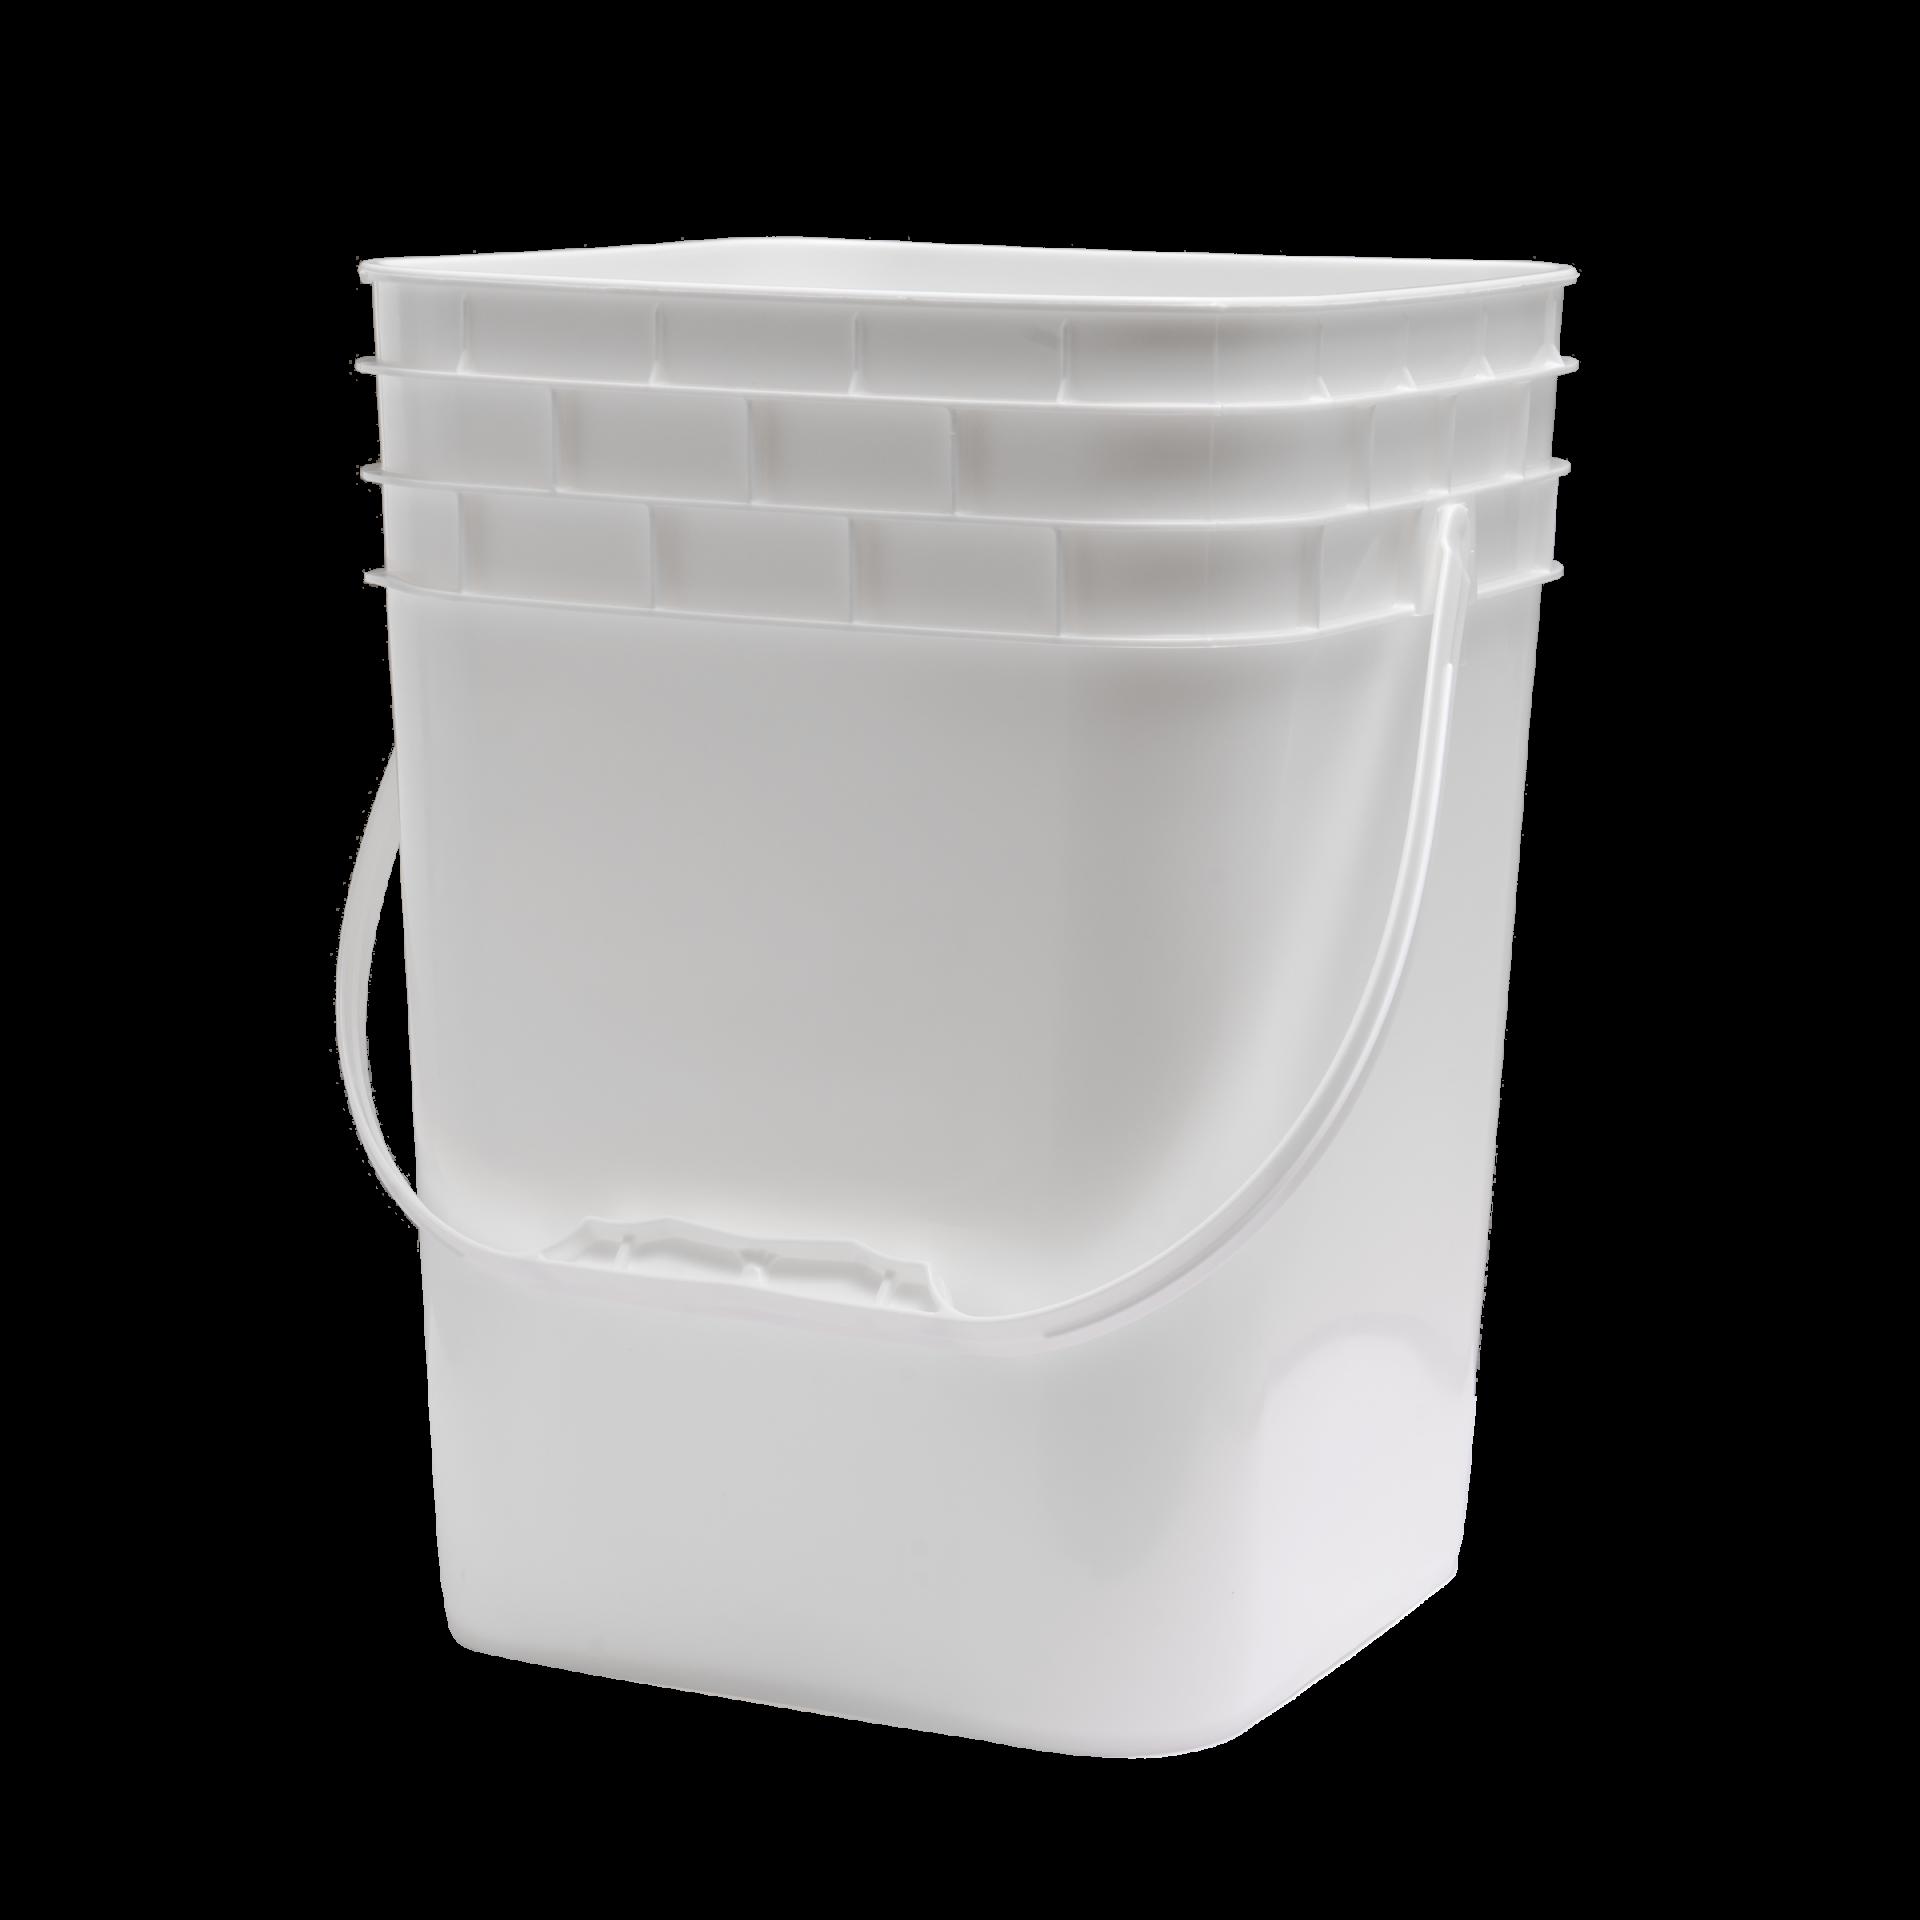 4 Gallon Pail Square White plastic handle